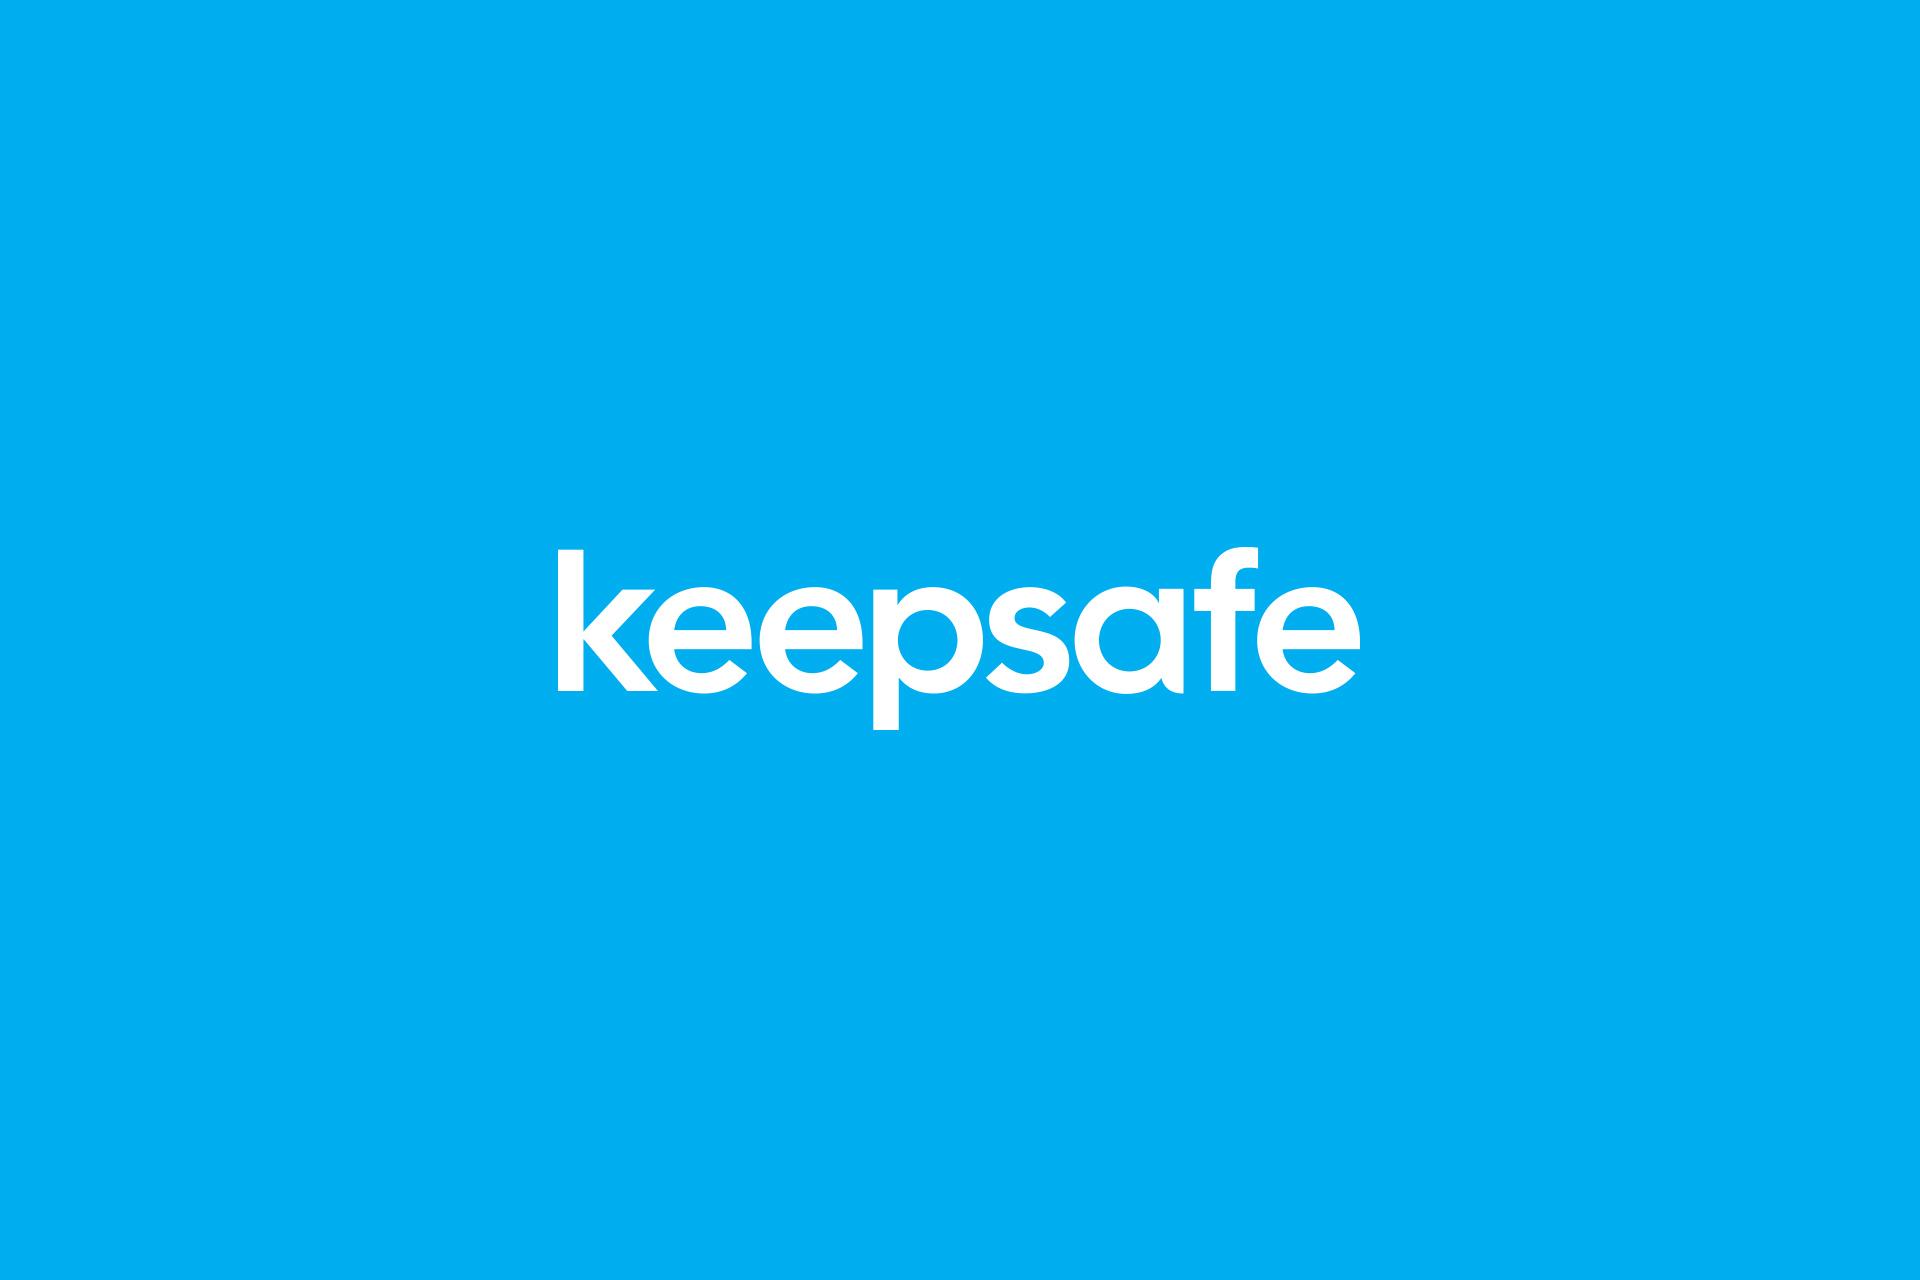 Anagraph-Keepsafe-logo.jpeg